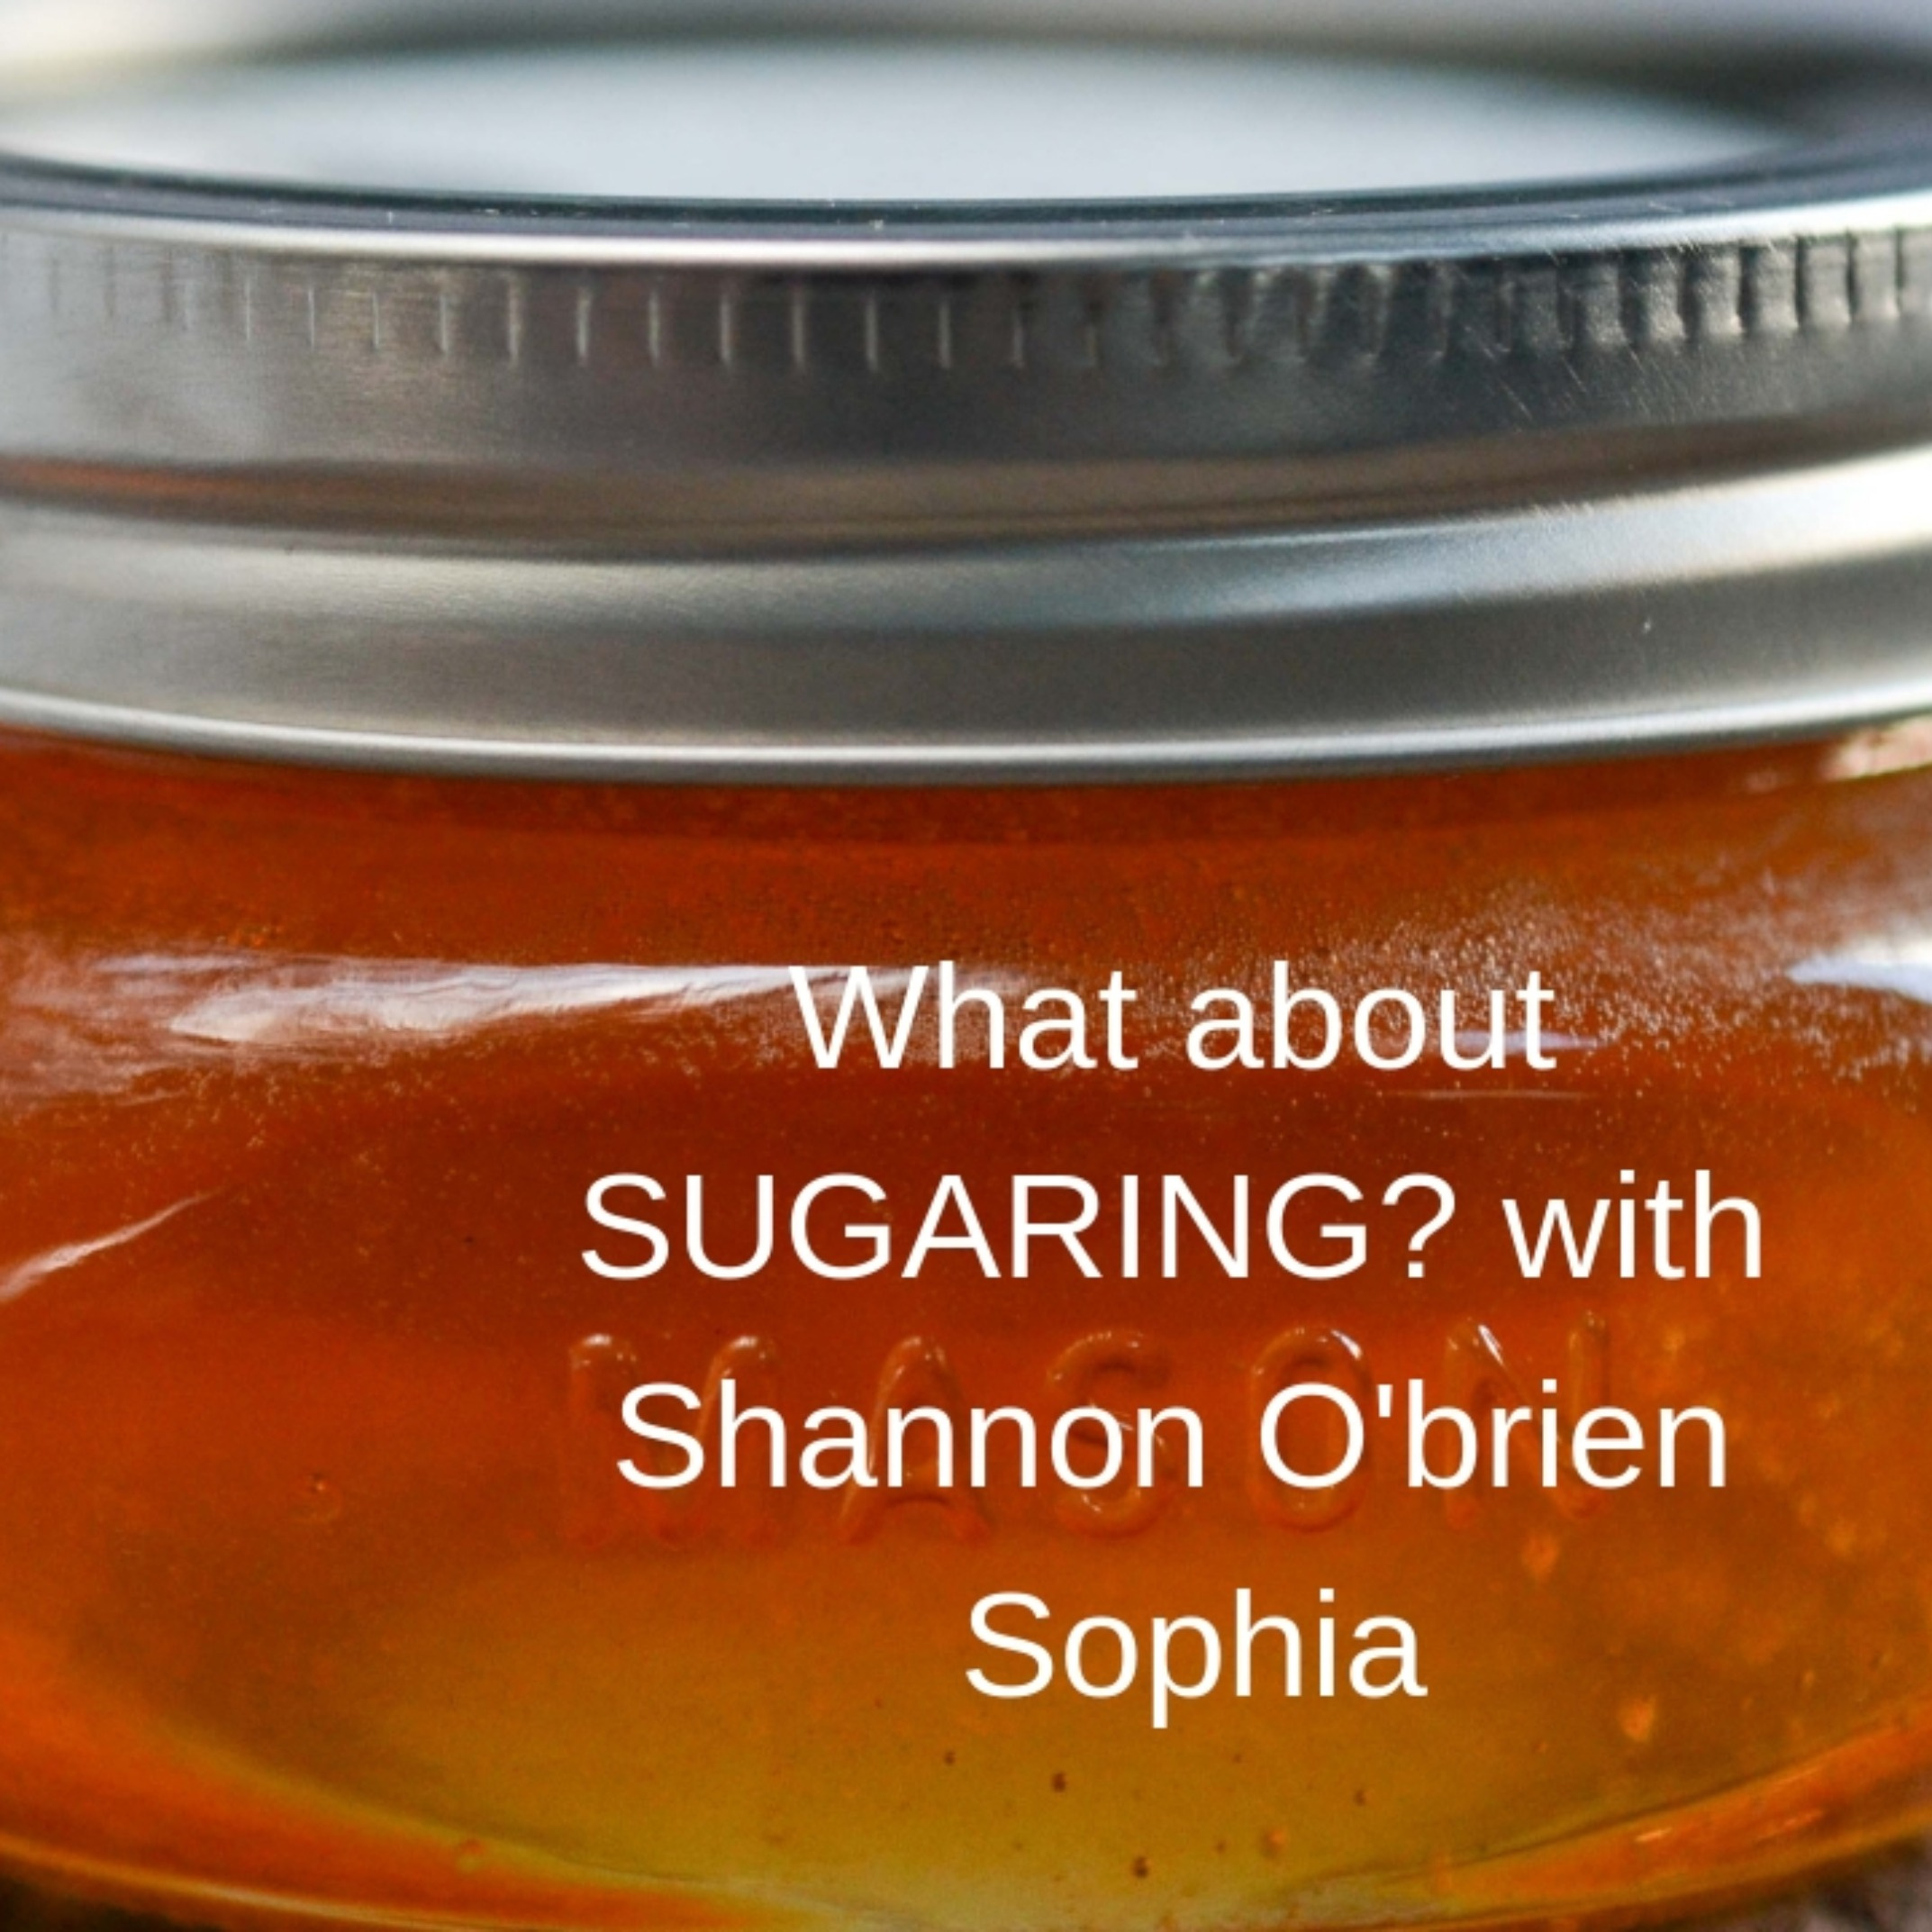 Let's talk Sugaring with Shannon O'Brien Sophia of SugarU